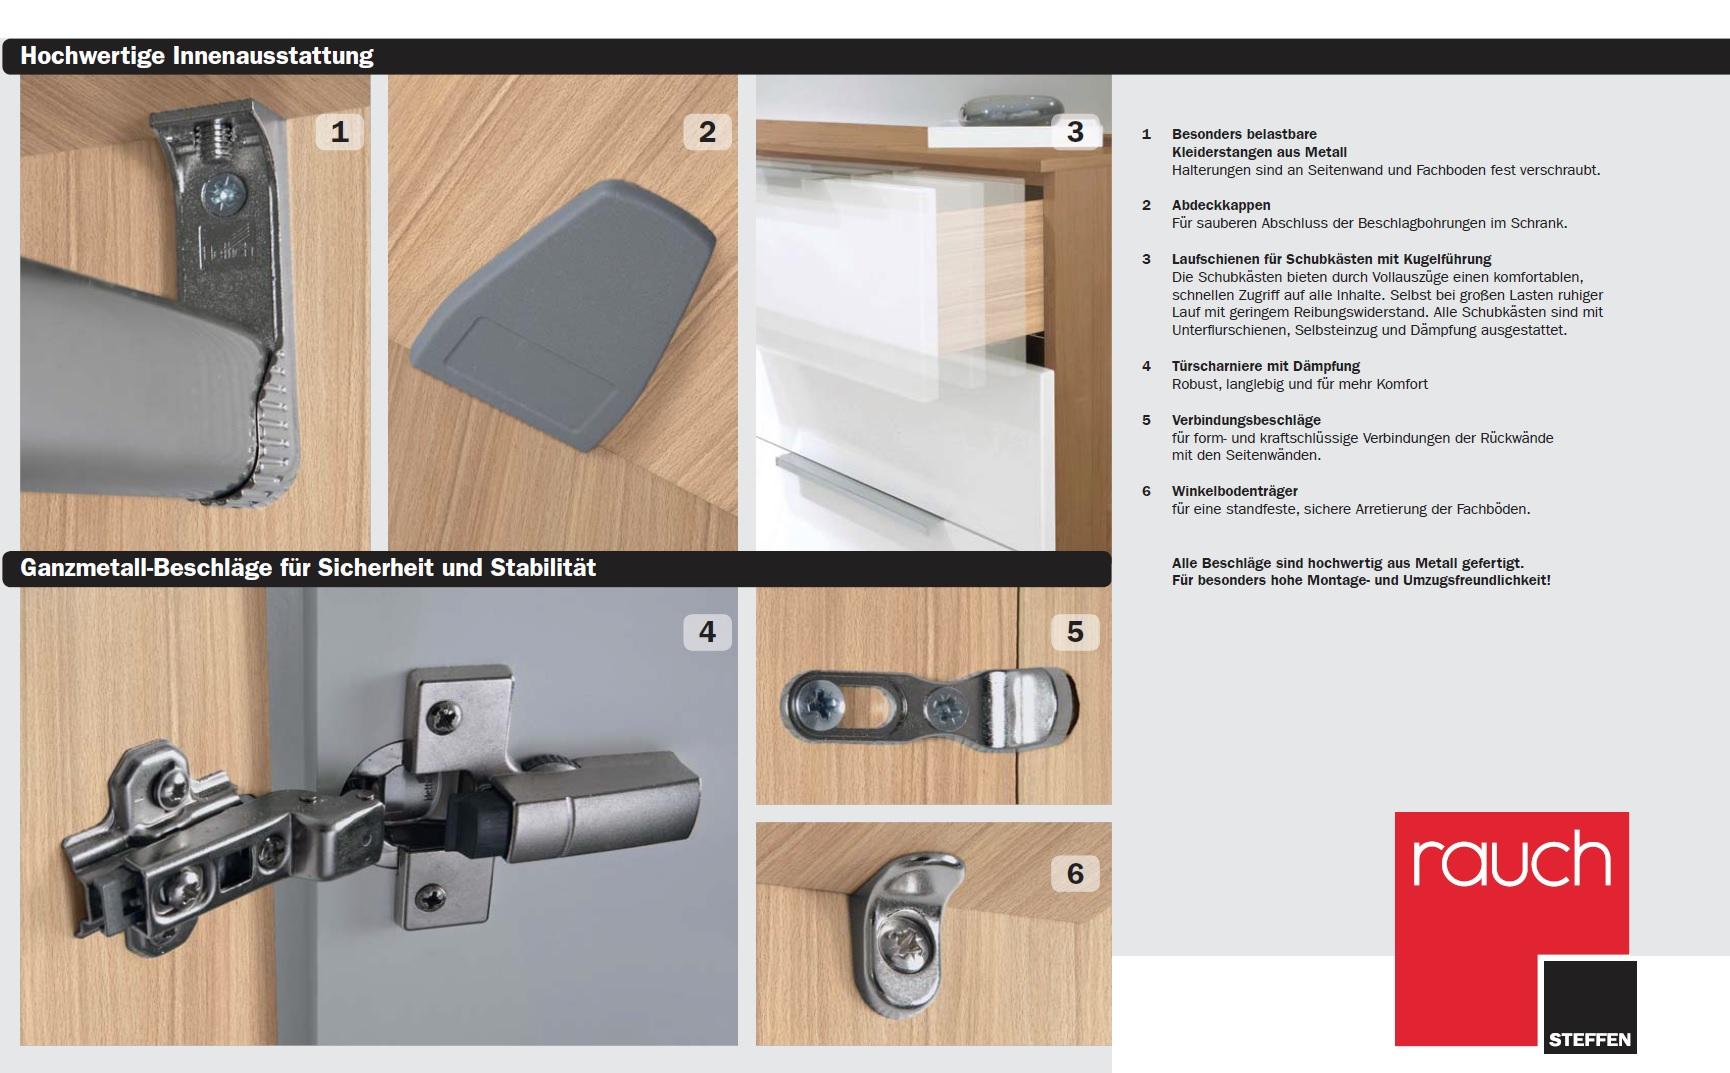 neu schlafzimmer programm made in germany x markt. Black Bedroom Furniture Sets. Home Design Ideas